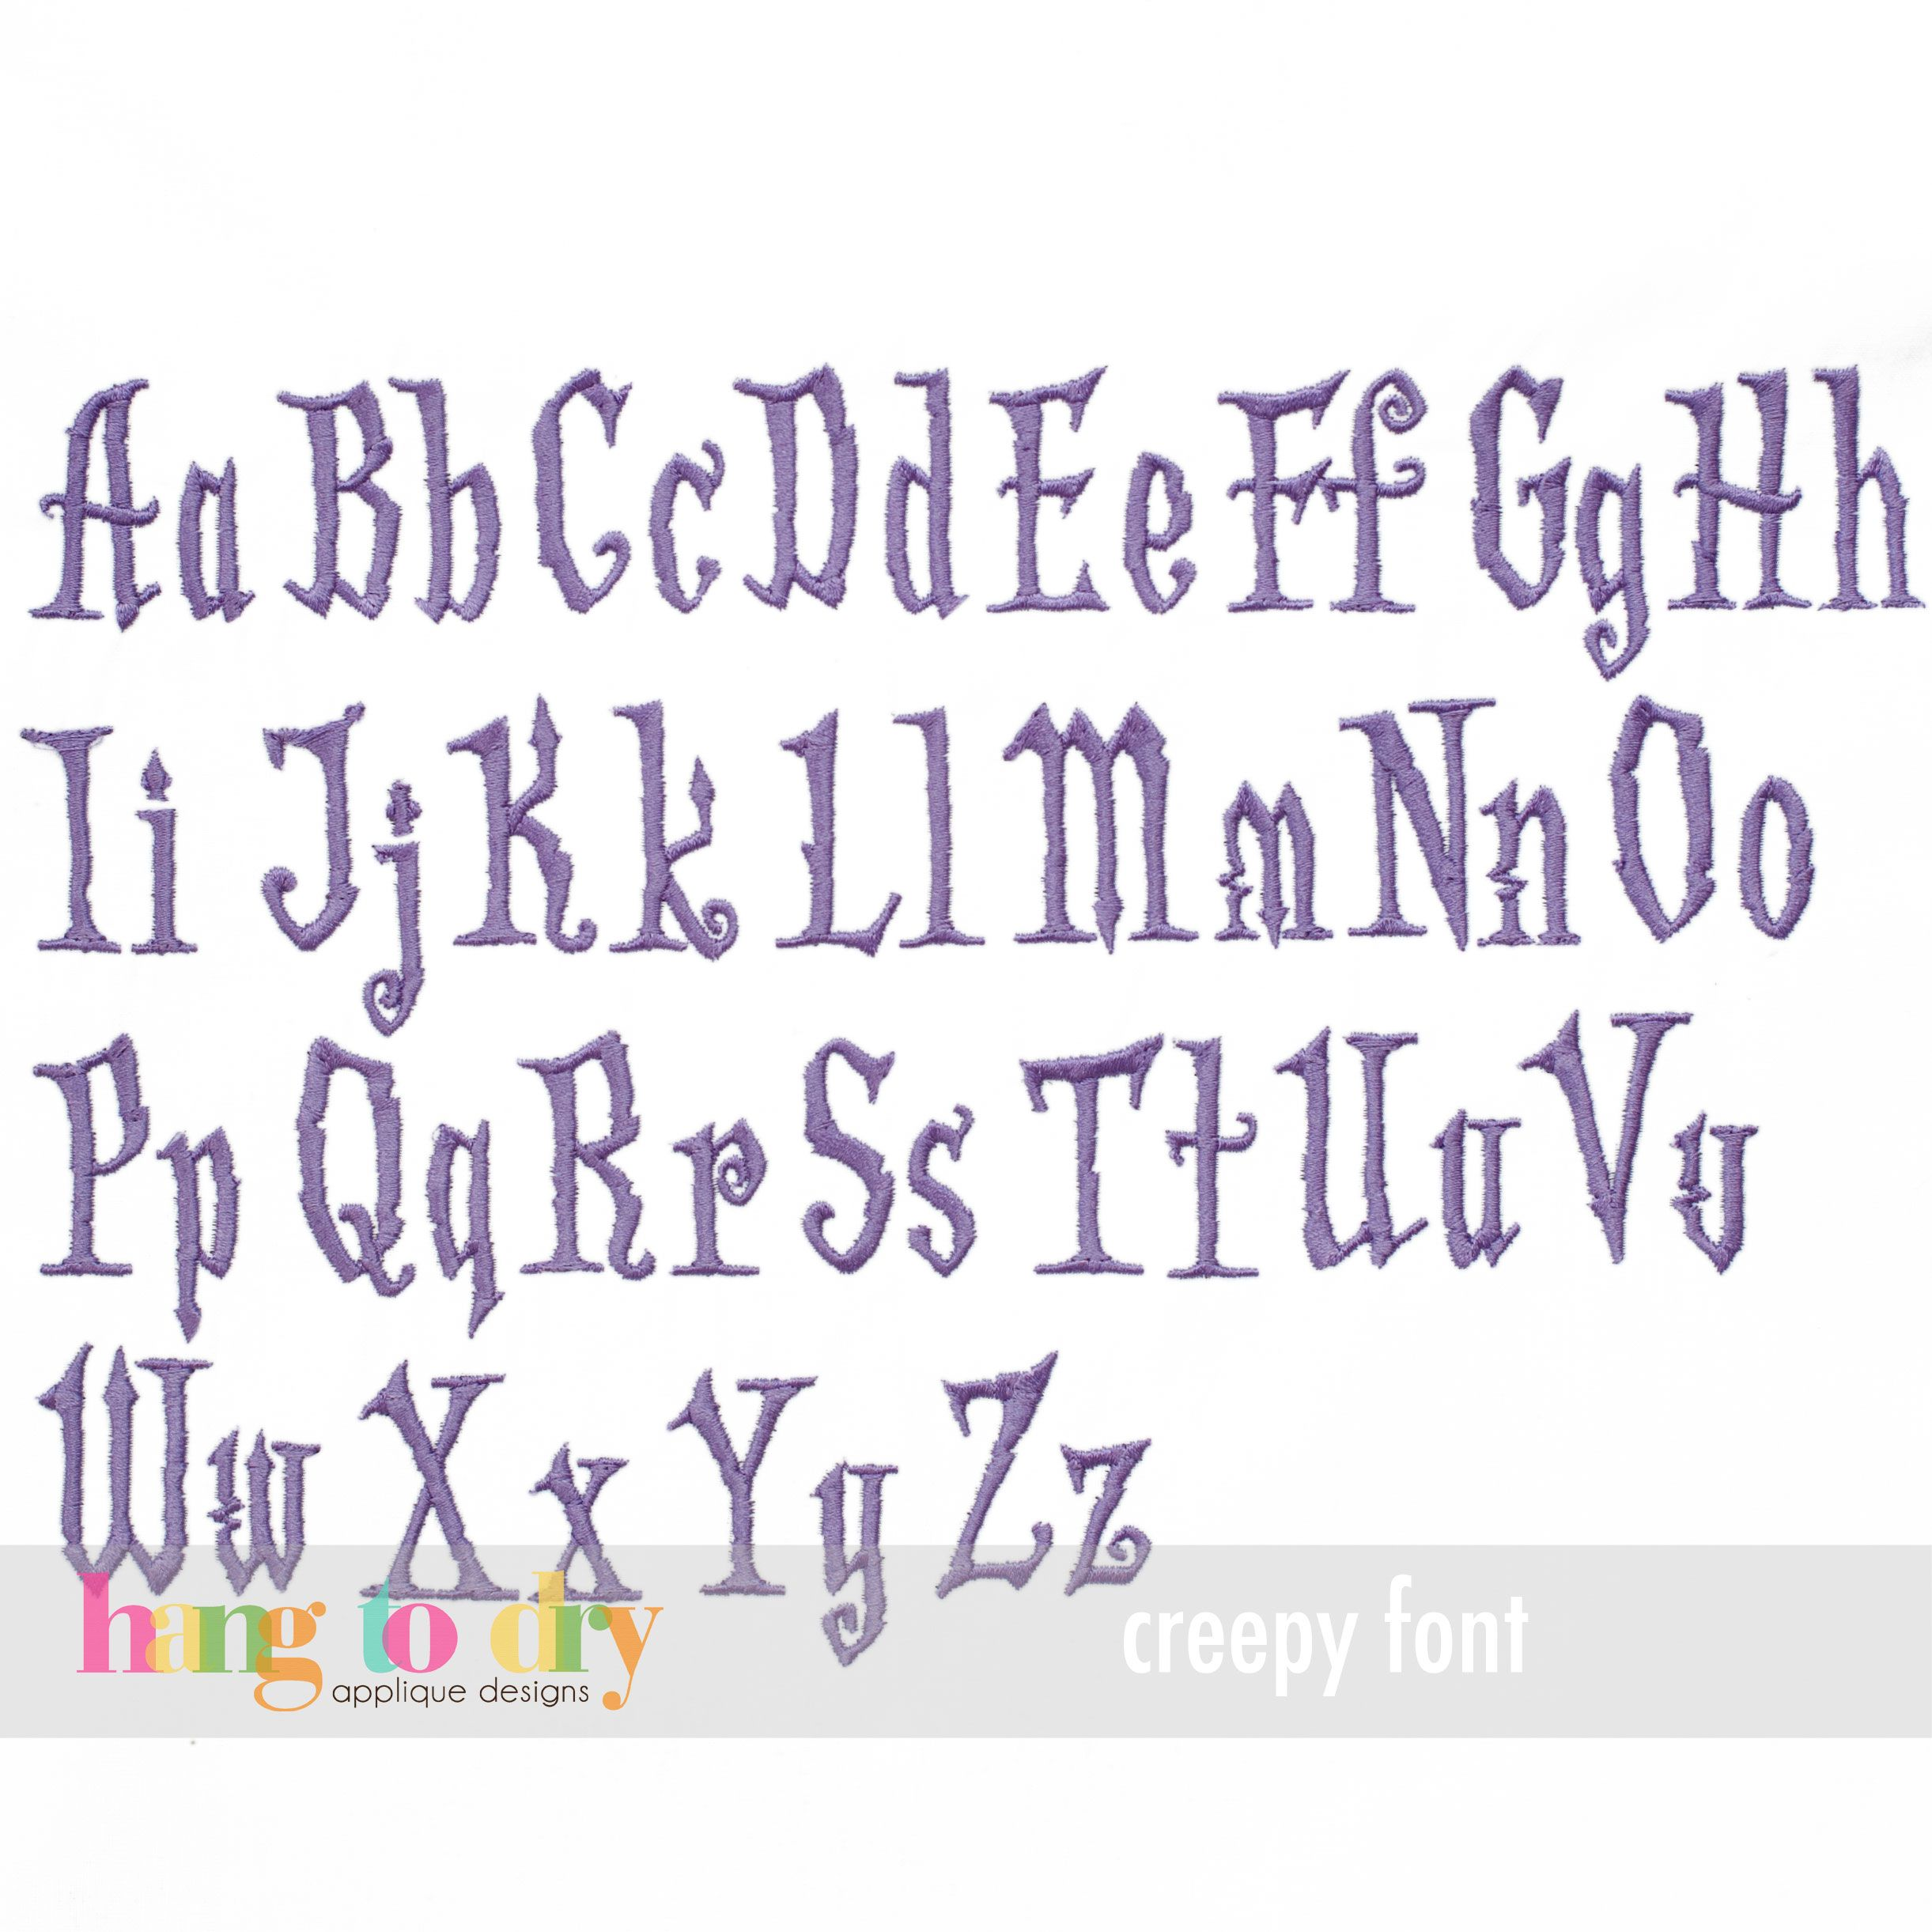 creepy font perfect for halloween - Halloween Writing Font